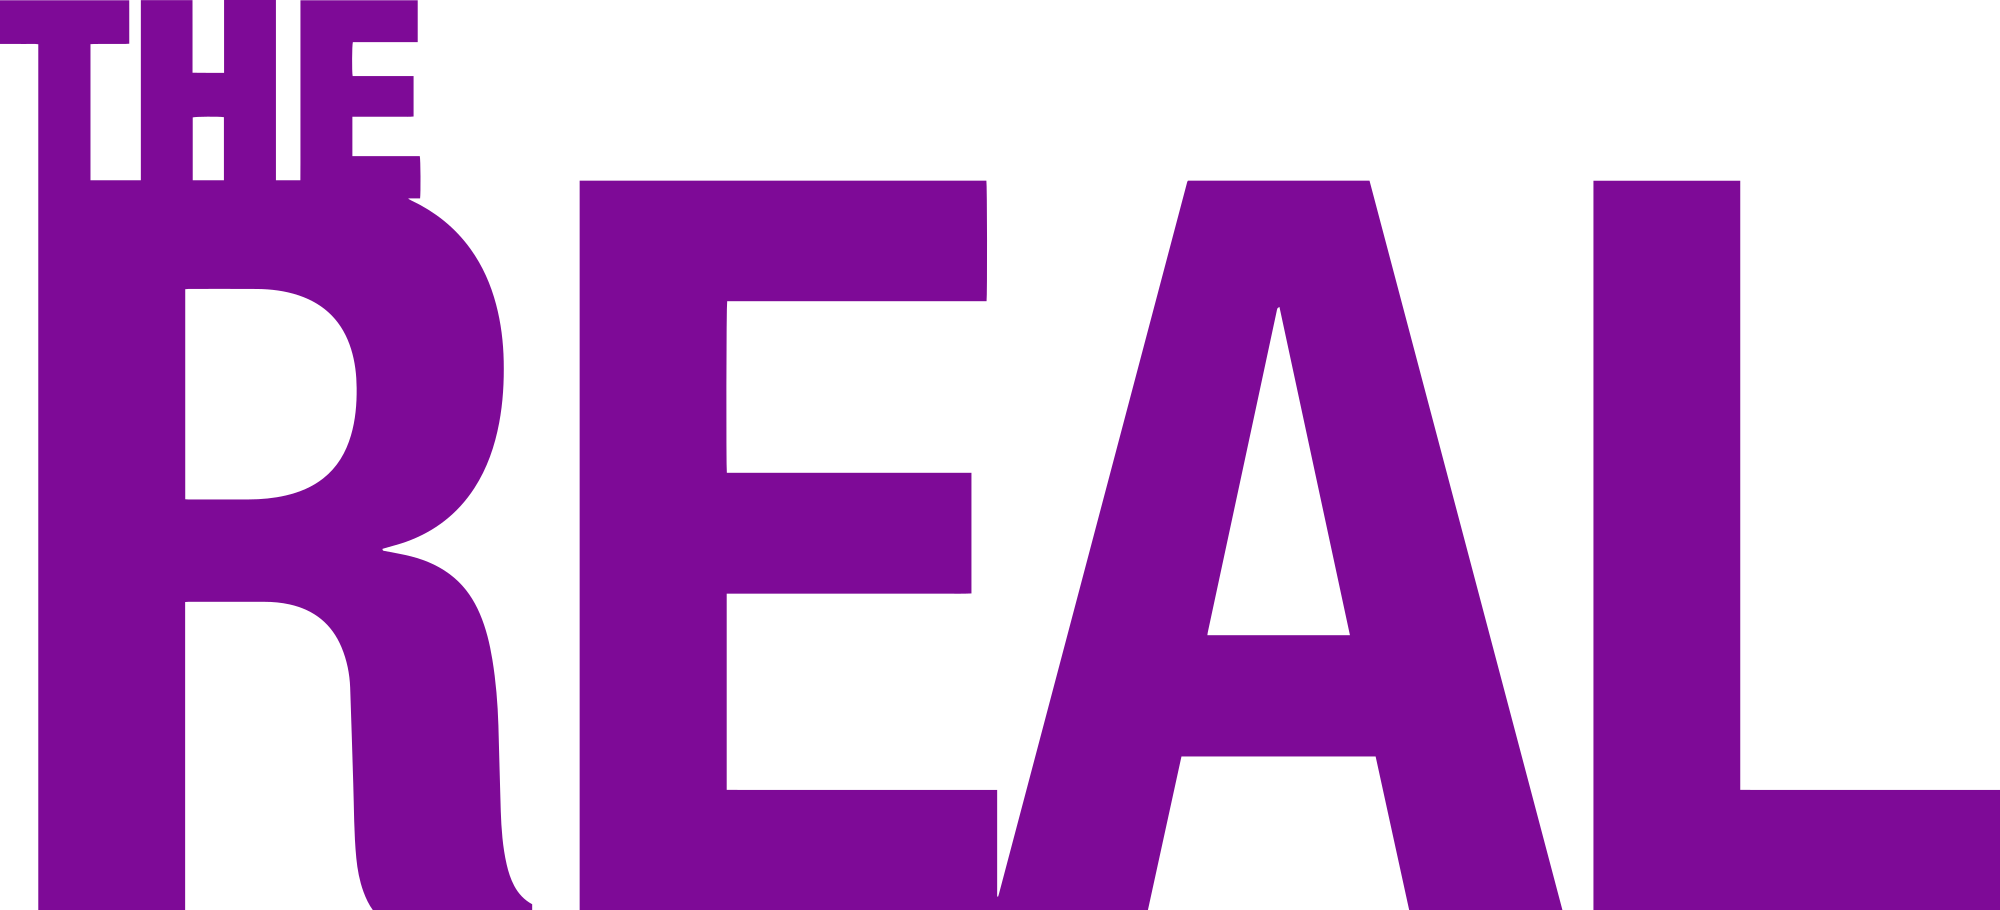 The_Real_logo.jpg